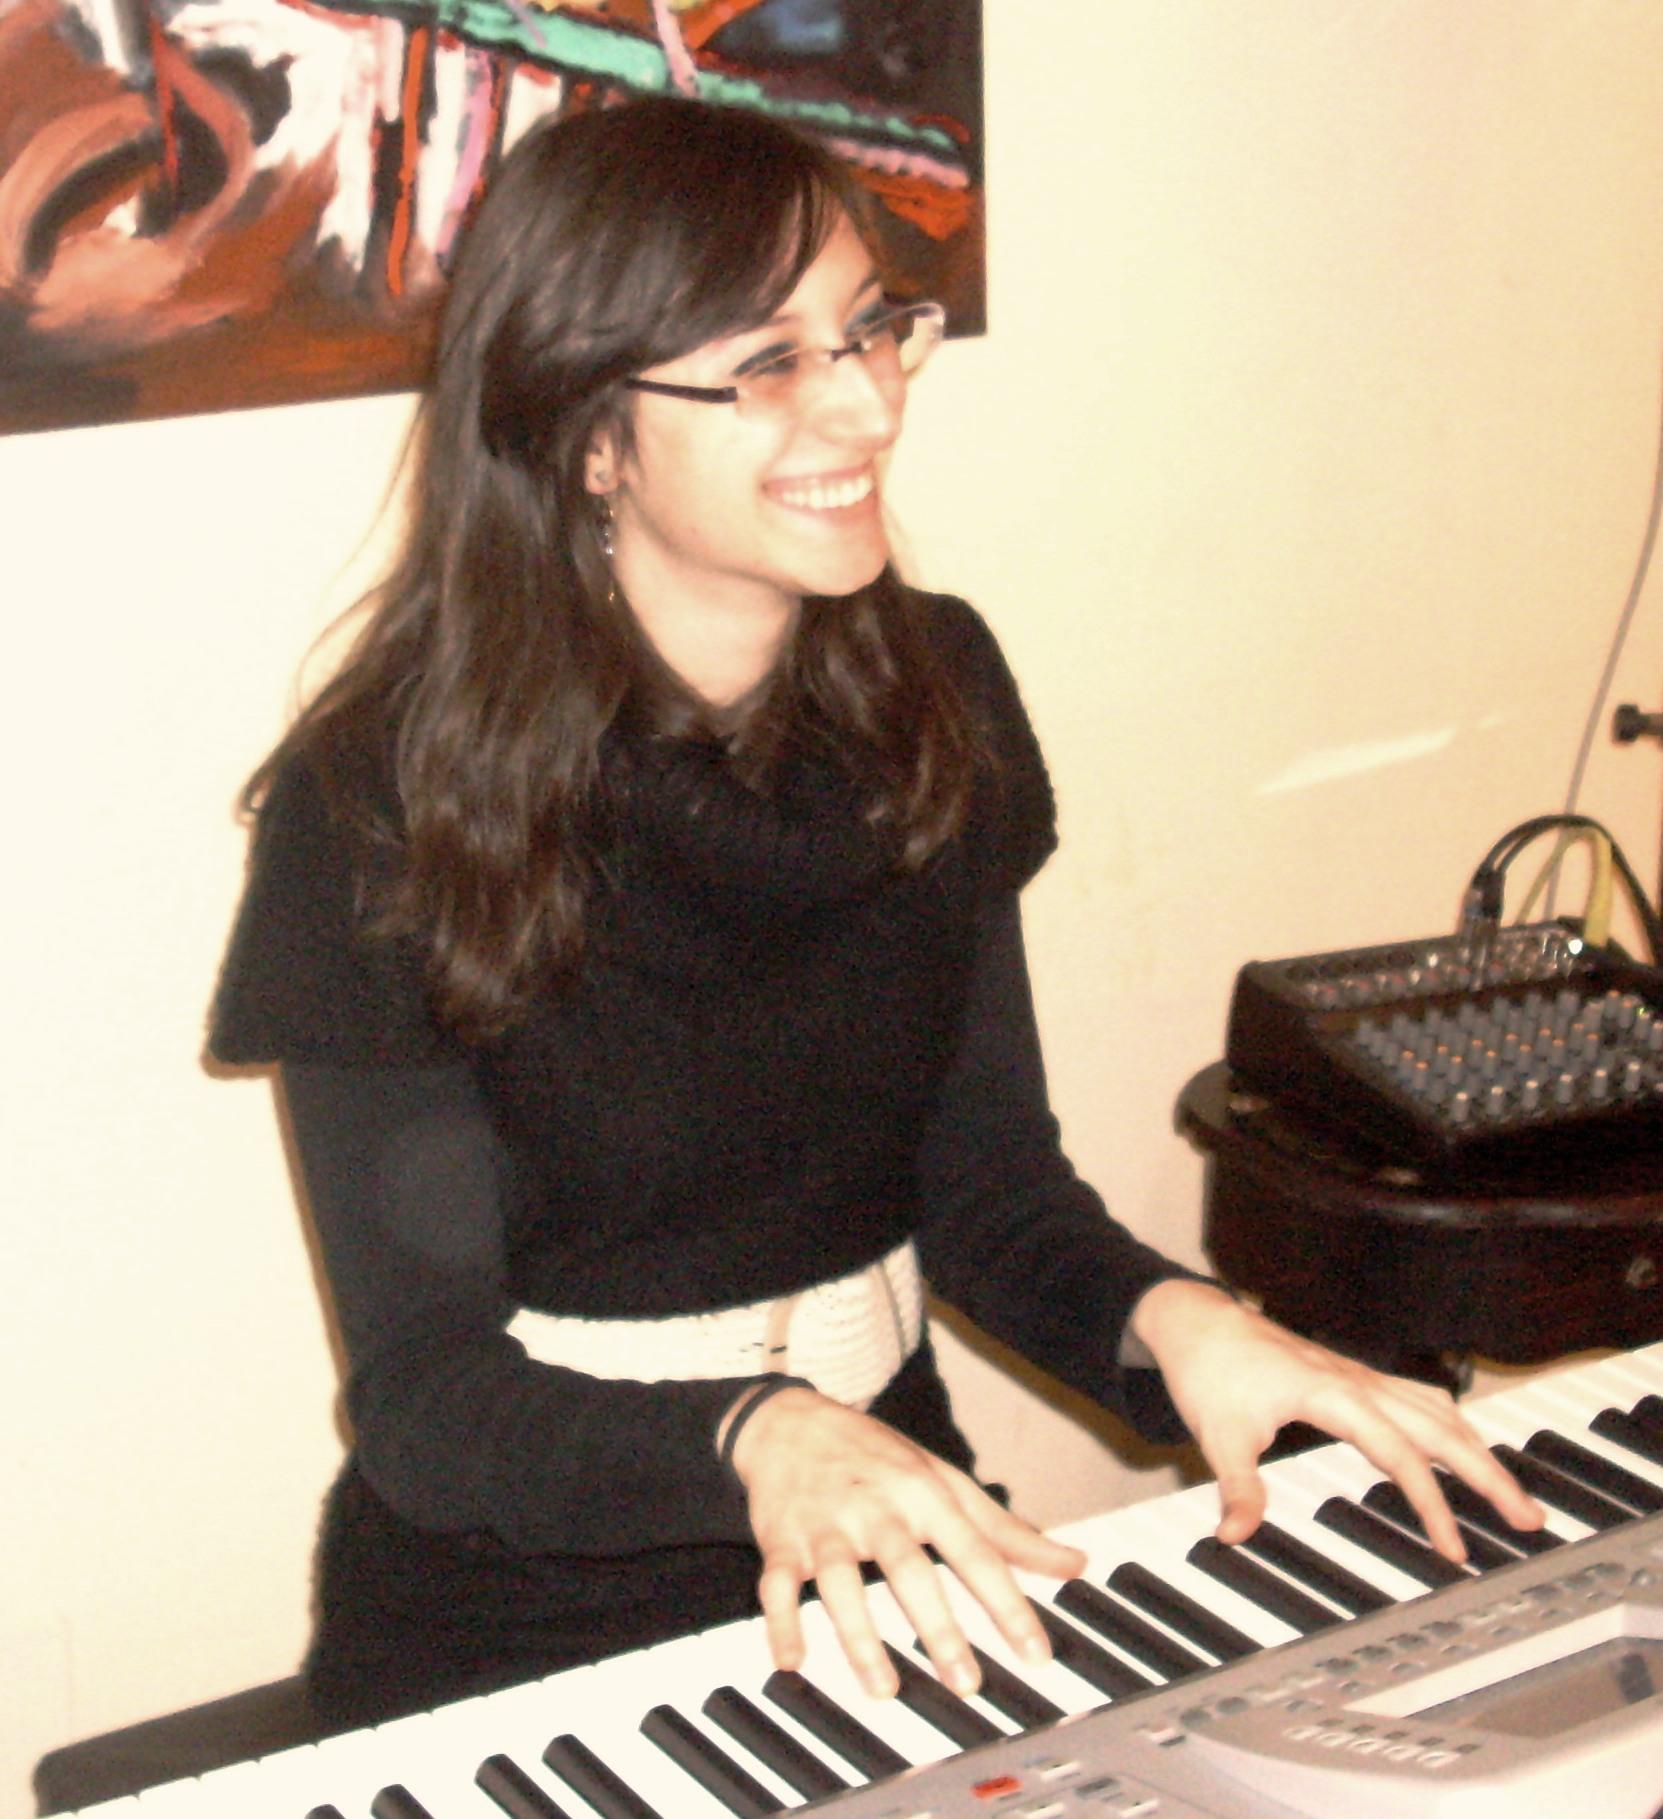 Alessia Palomba 2013 12 31 - comp